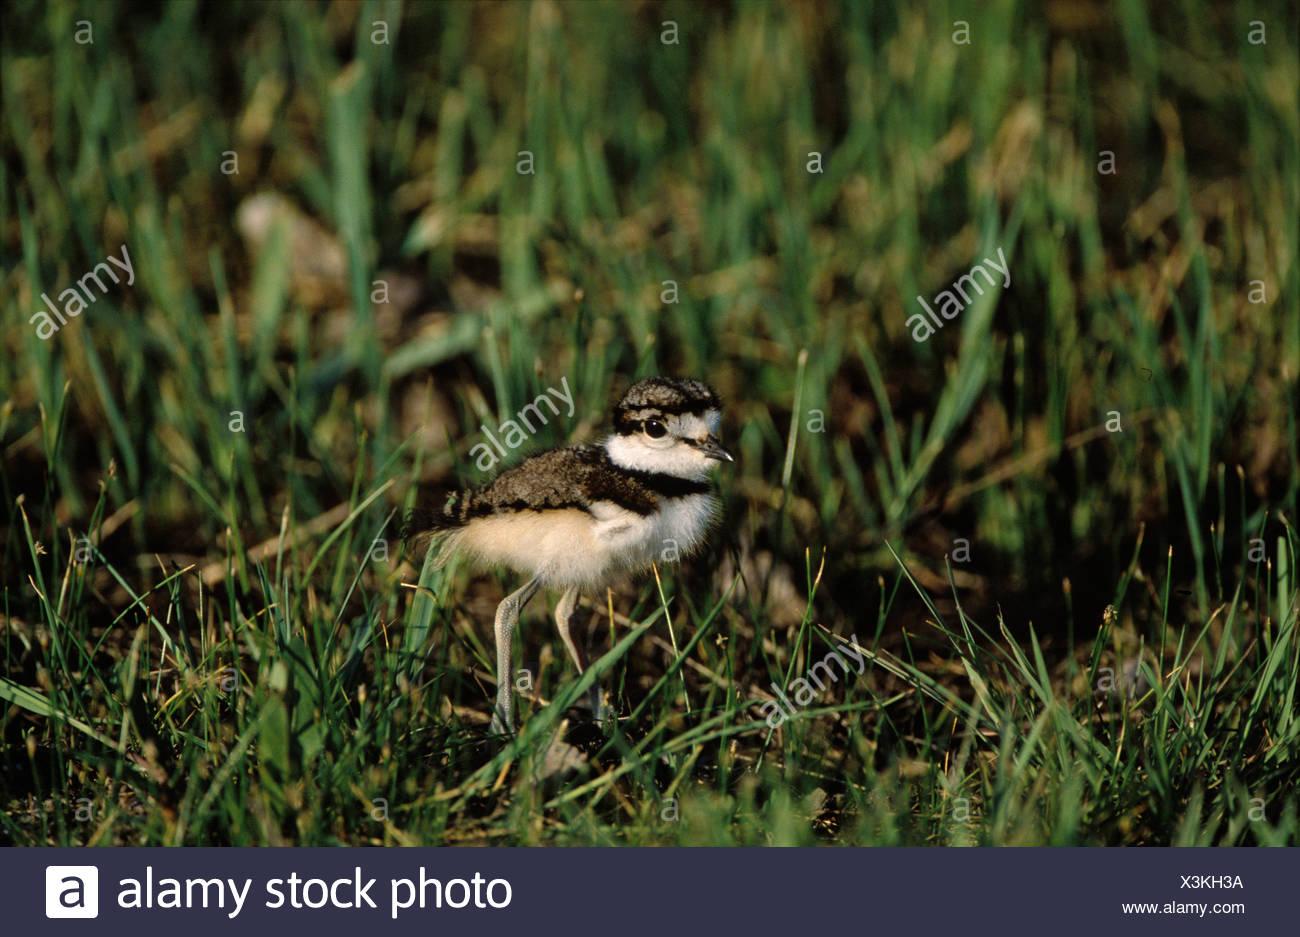 Killdeer (Charadrius vociferus) chick, Prince Edward Point National Wildlife Area, Ontario, Canada - Stock Image